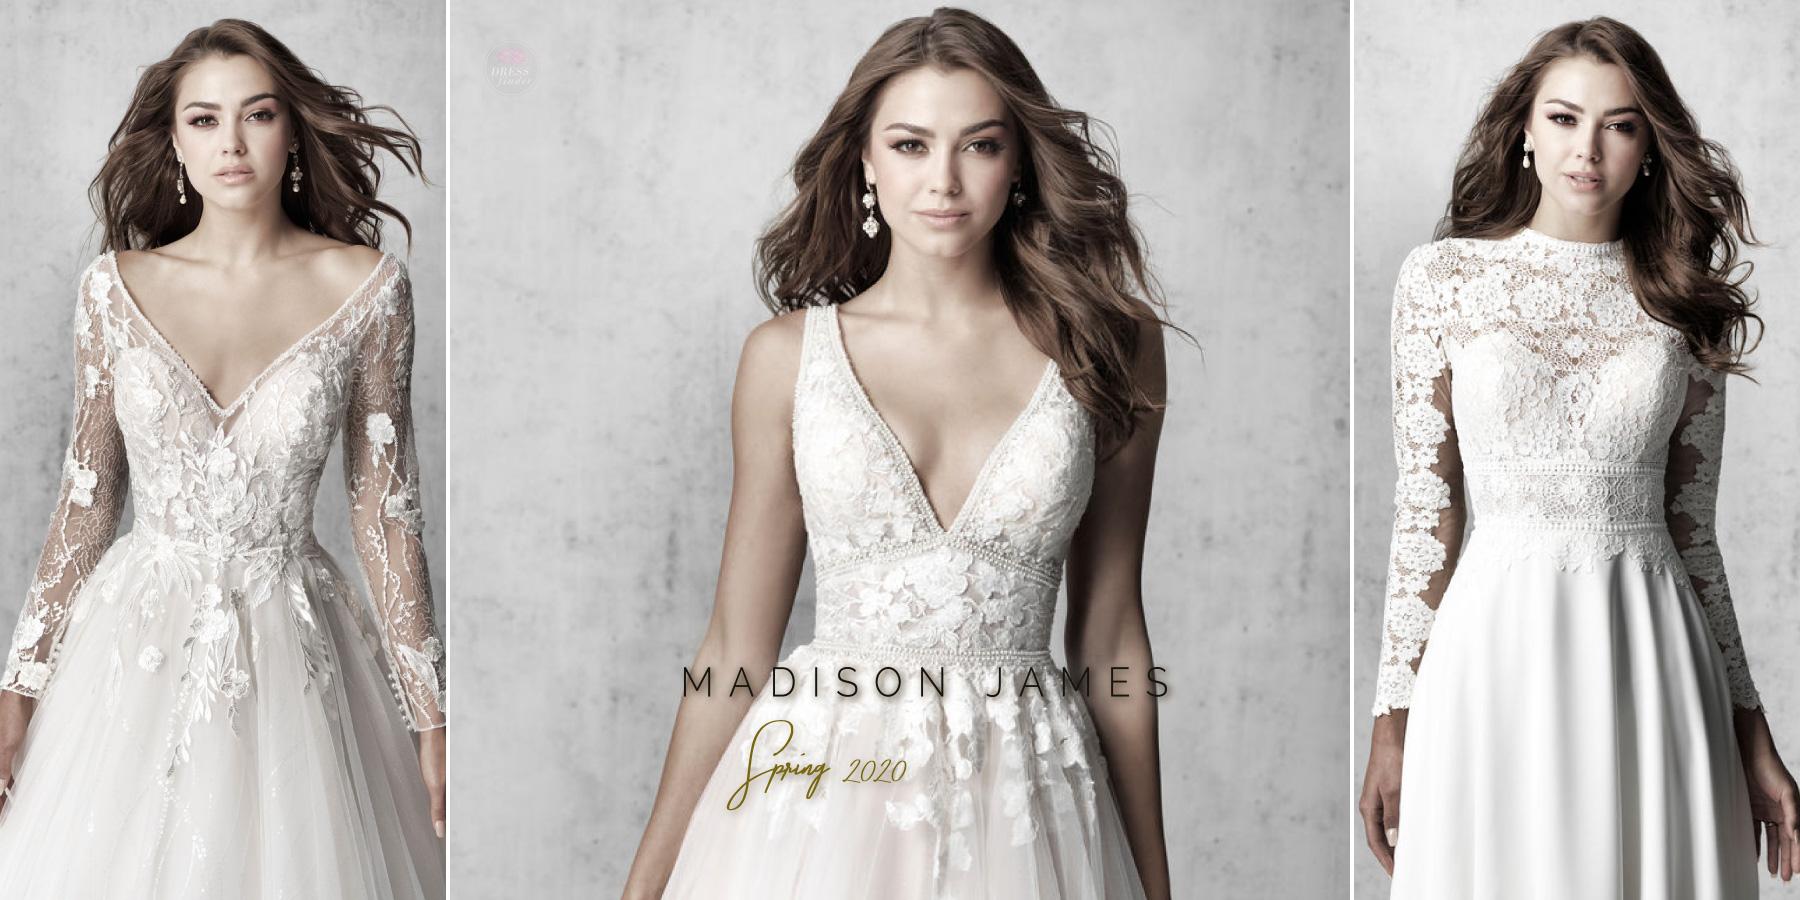 Madison James